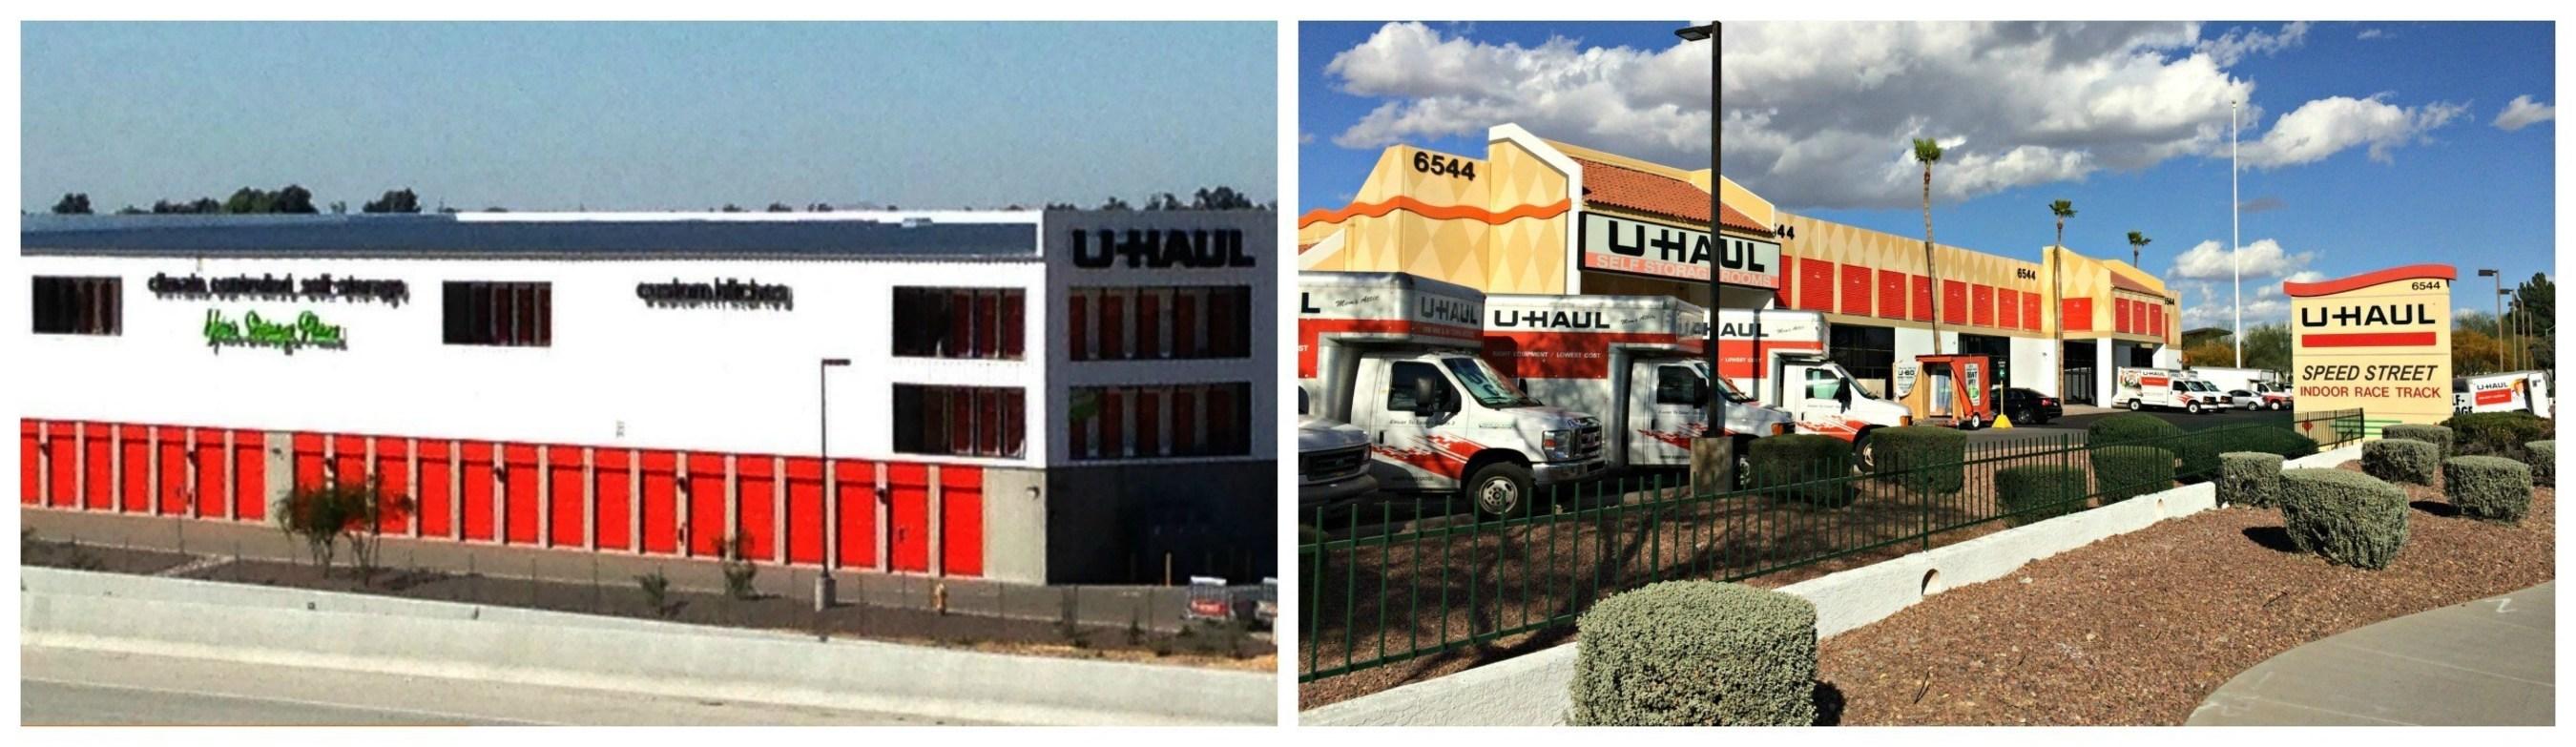 U-Haul Celebrates Grand Openings of Two Phoenix Stores (PRNewsFoto/U-Haul)